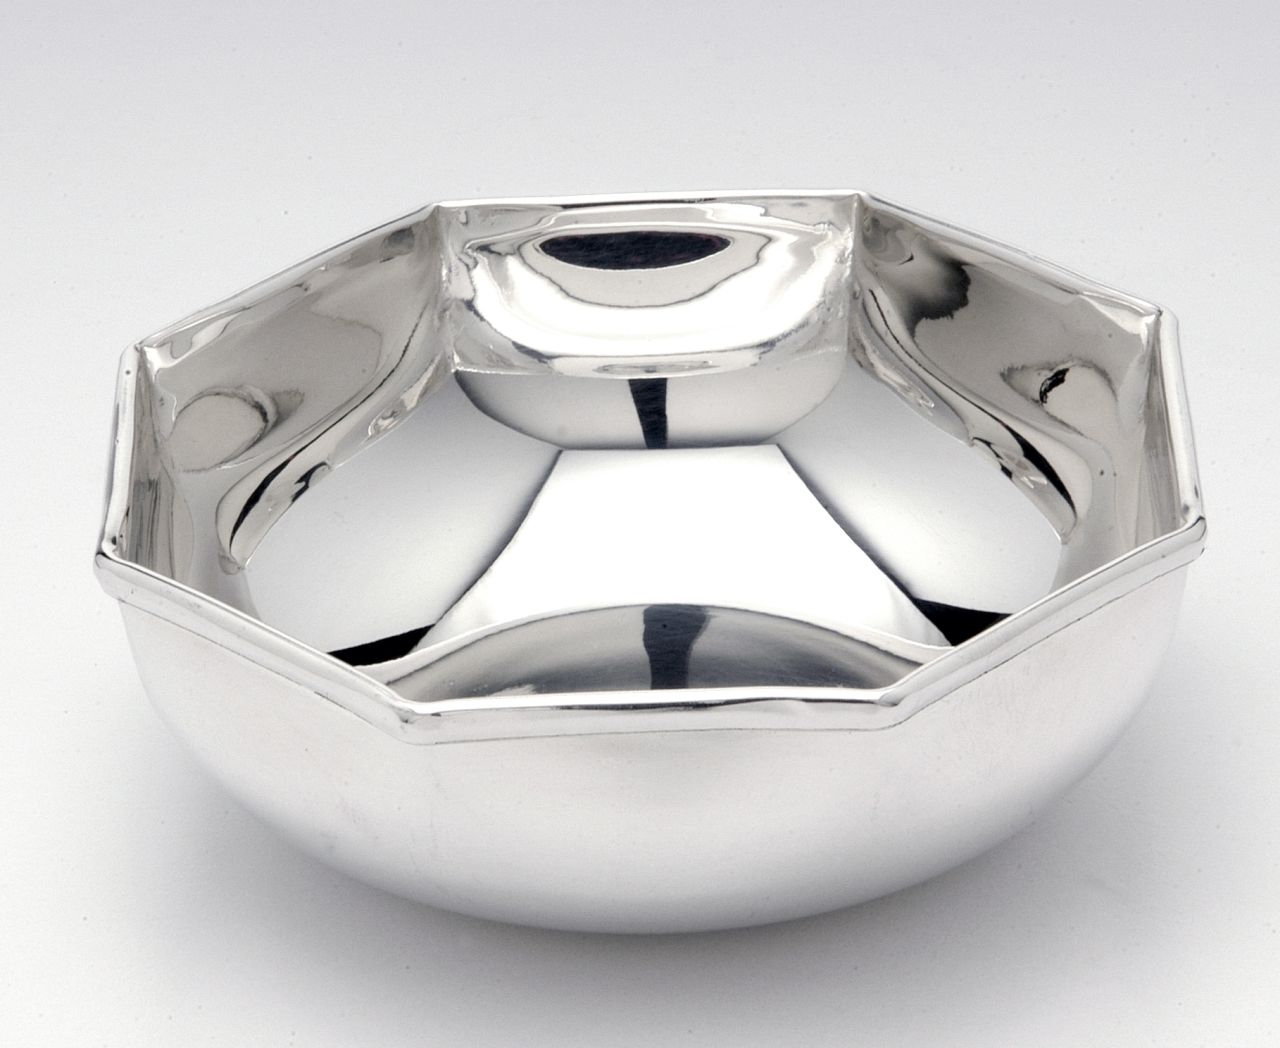 Ciotola placcata argento stile Ottagonale cm.5h diam.16